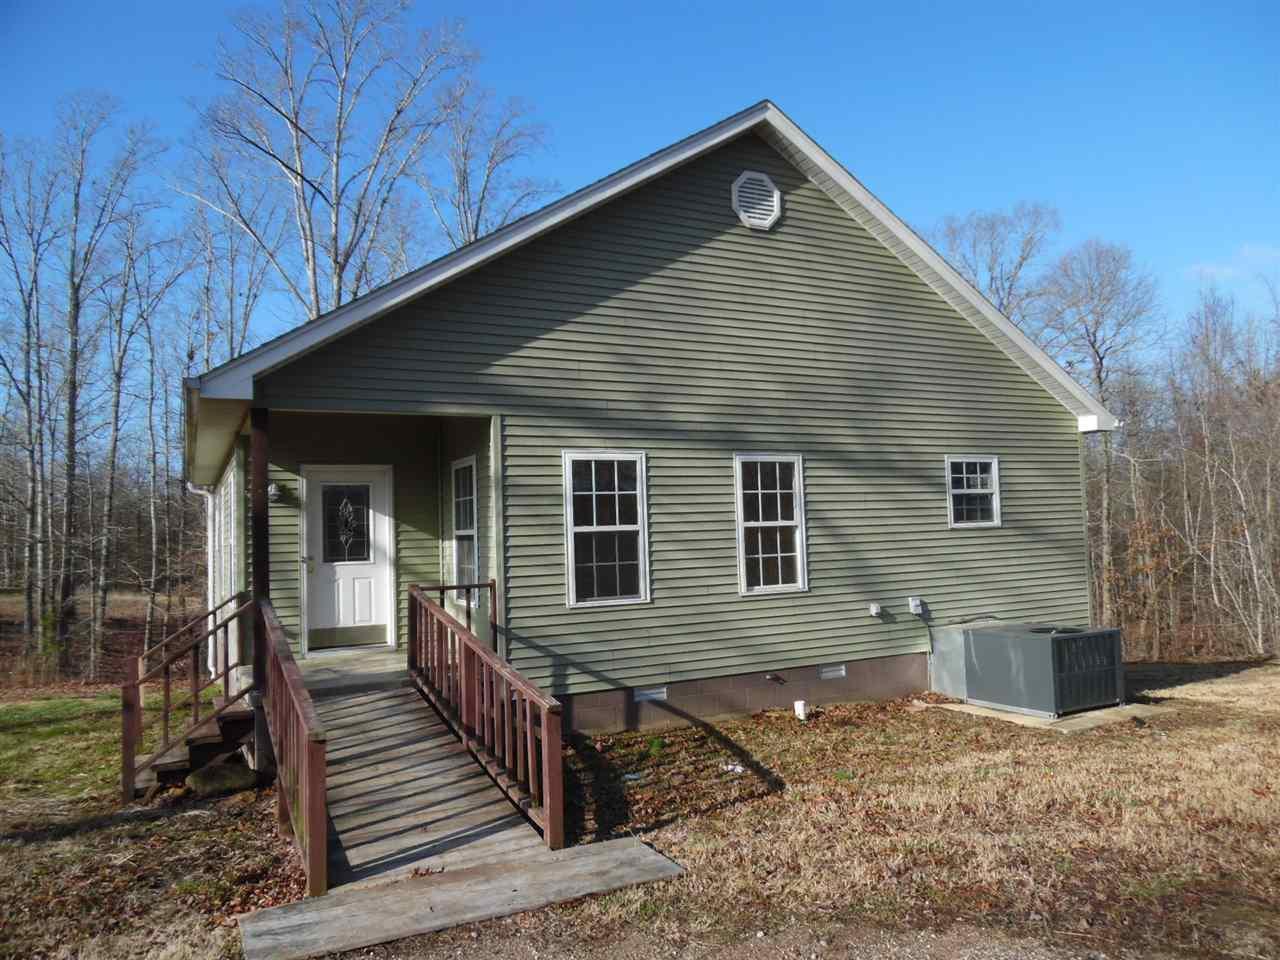 1490 Walnut Grove Rd, Bolivar, TN